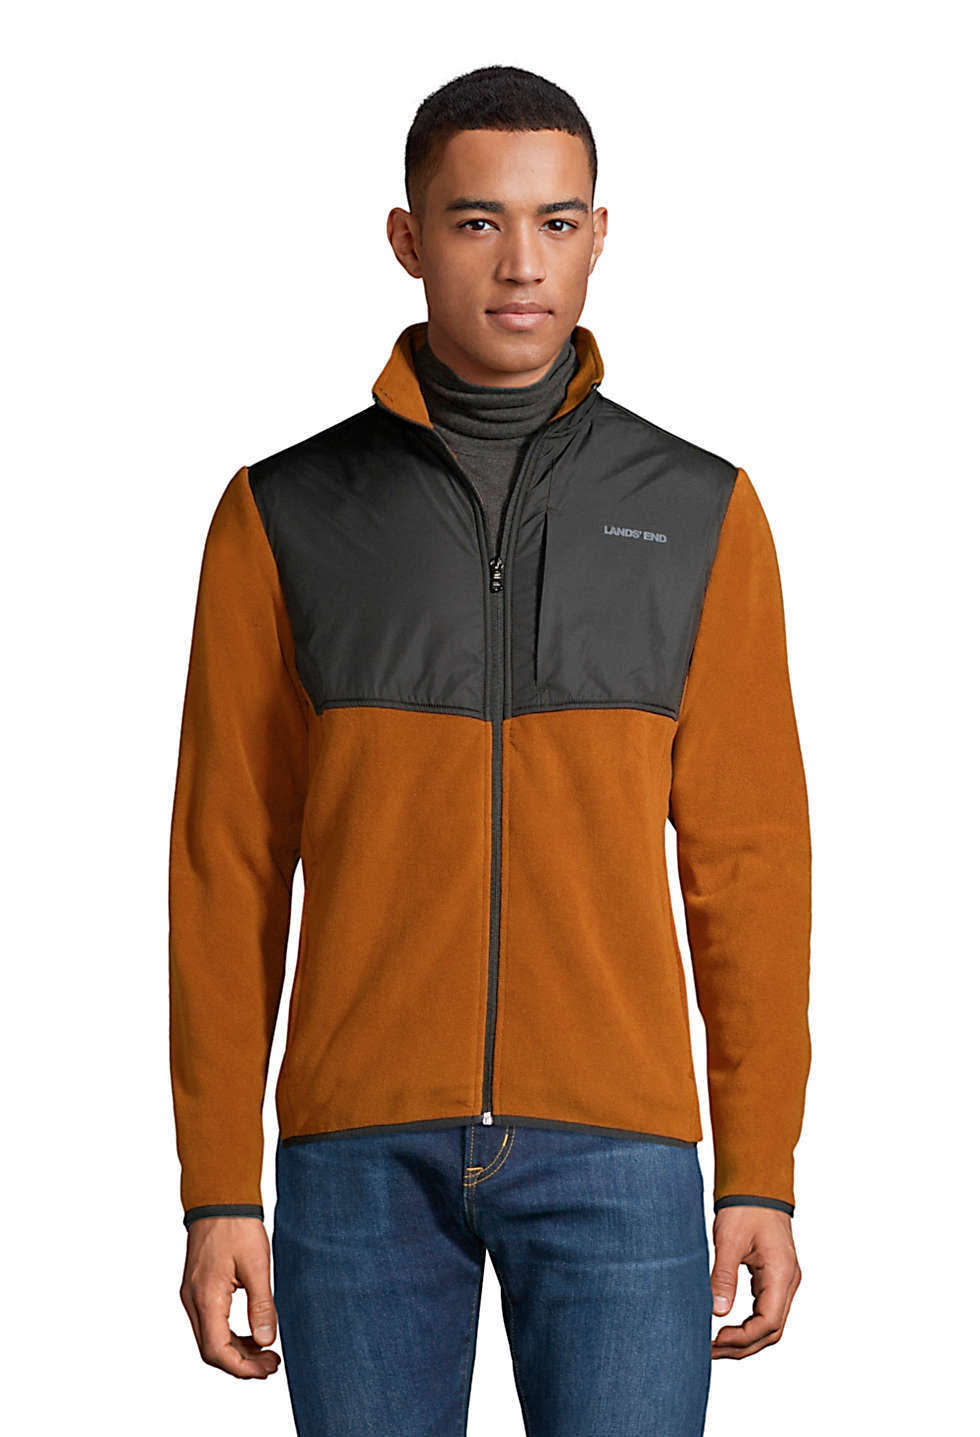 Lands' End Men's T200 Fleece Jacket